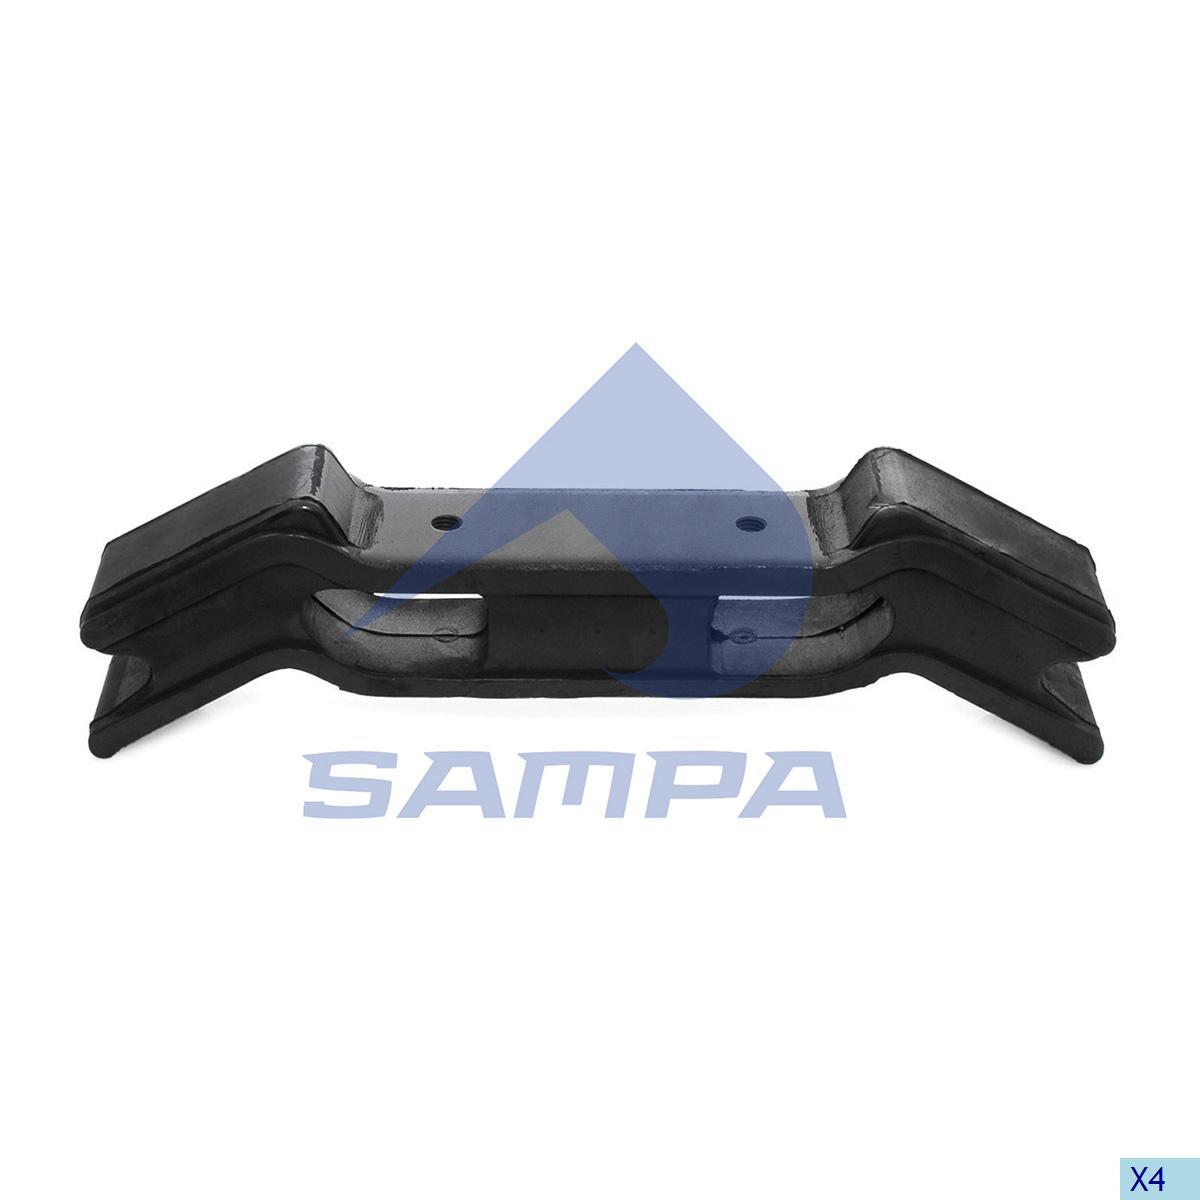 Mounting, Gear Box, Scania, Gear Box